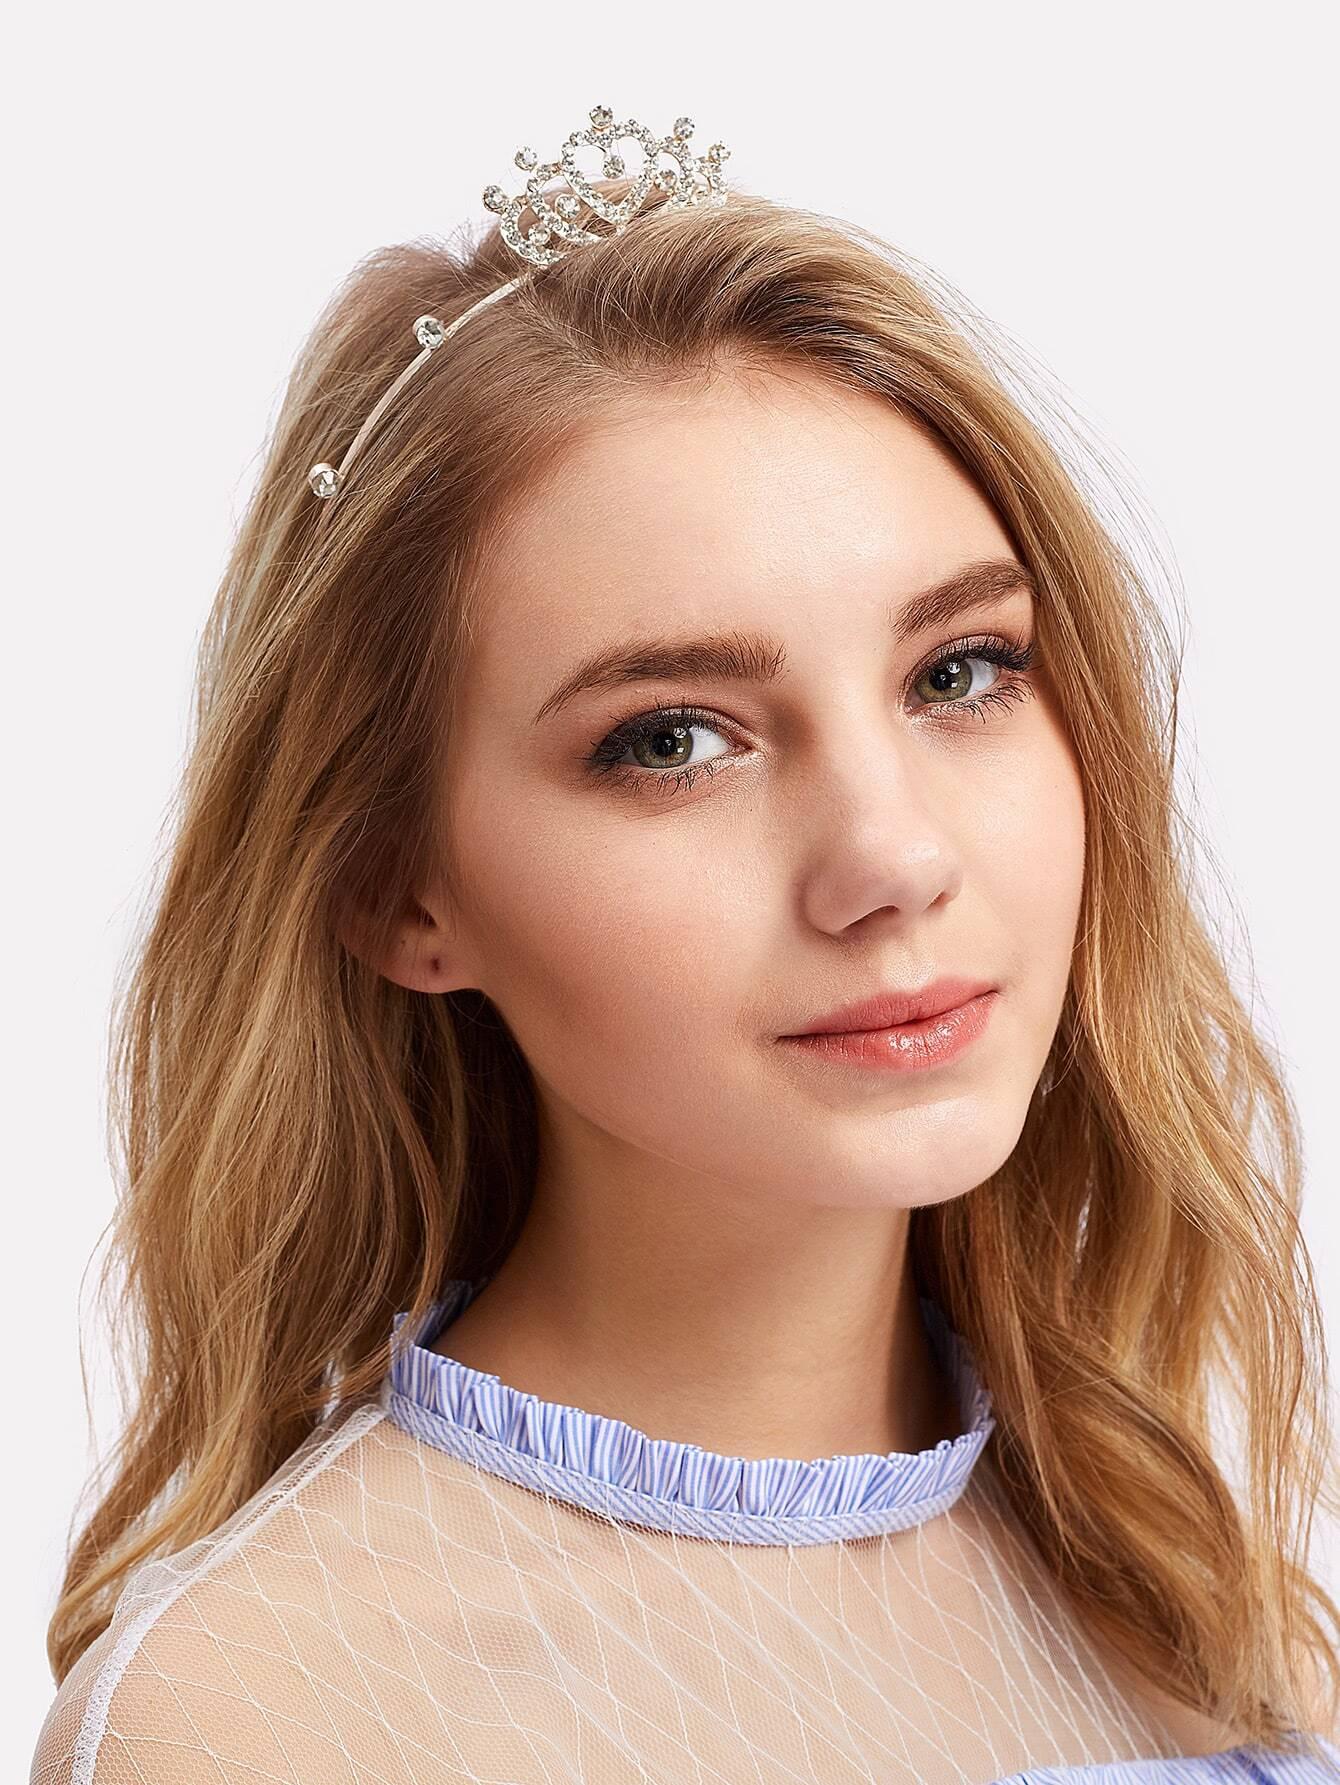 Rhinestone Crown Decorated Headband crown decorated headband